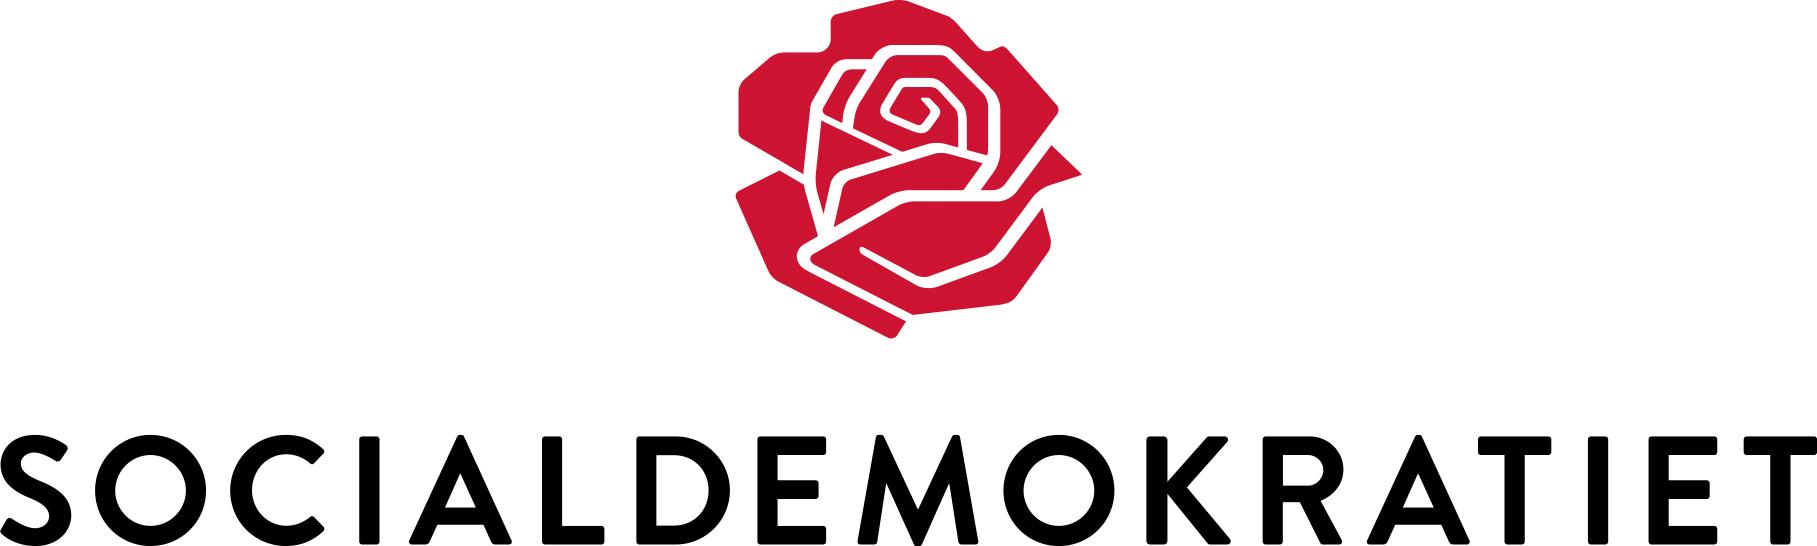 Socialdemokratiet, socialdemokatrerne, socialdemokrat, politik, folketinget